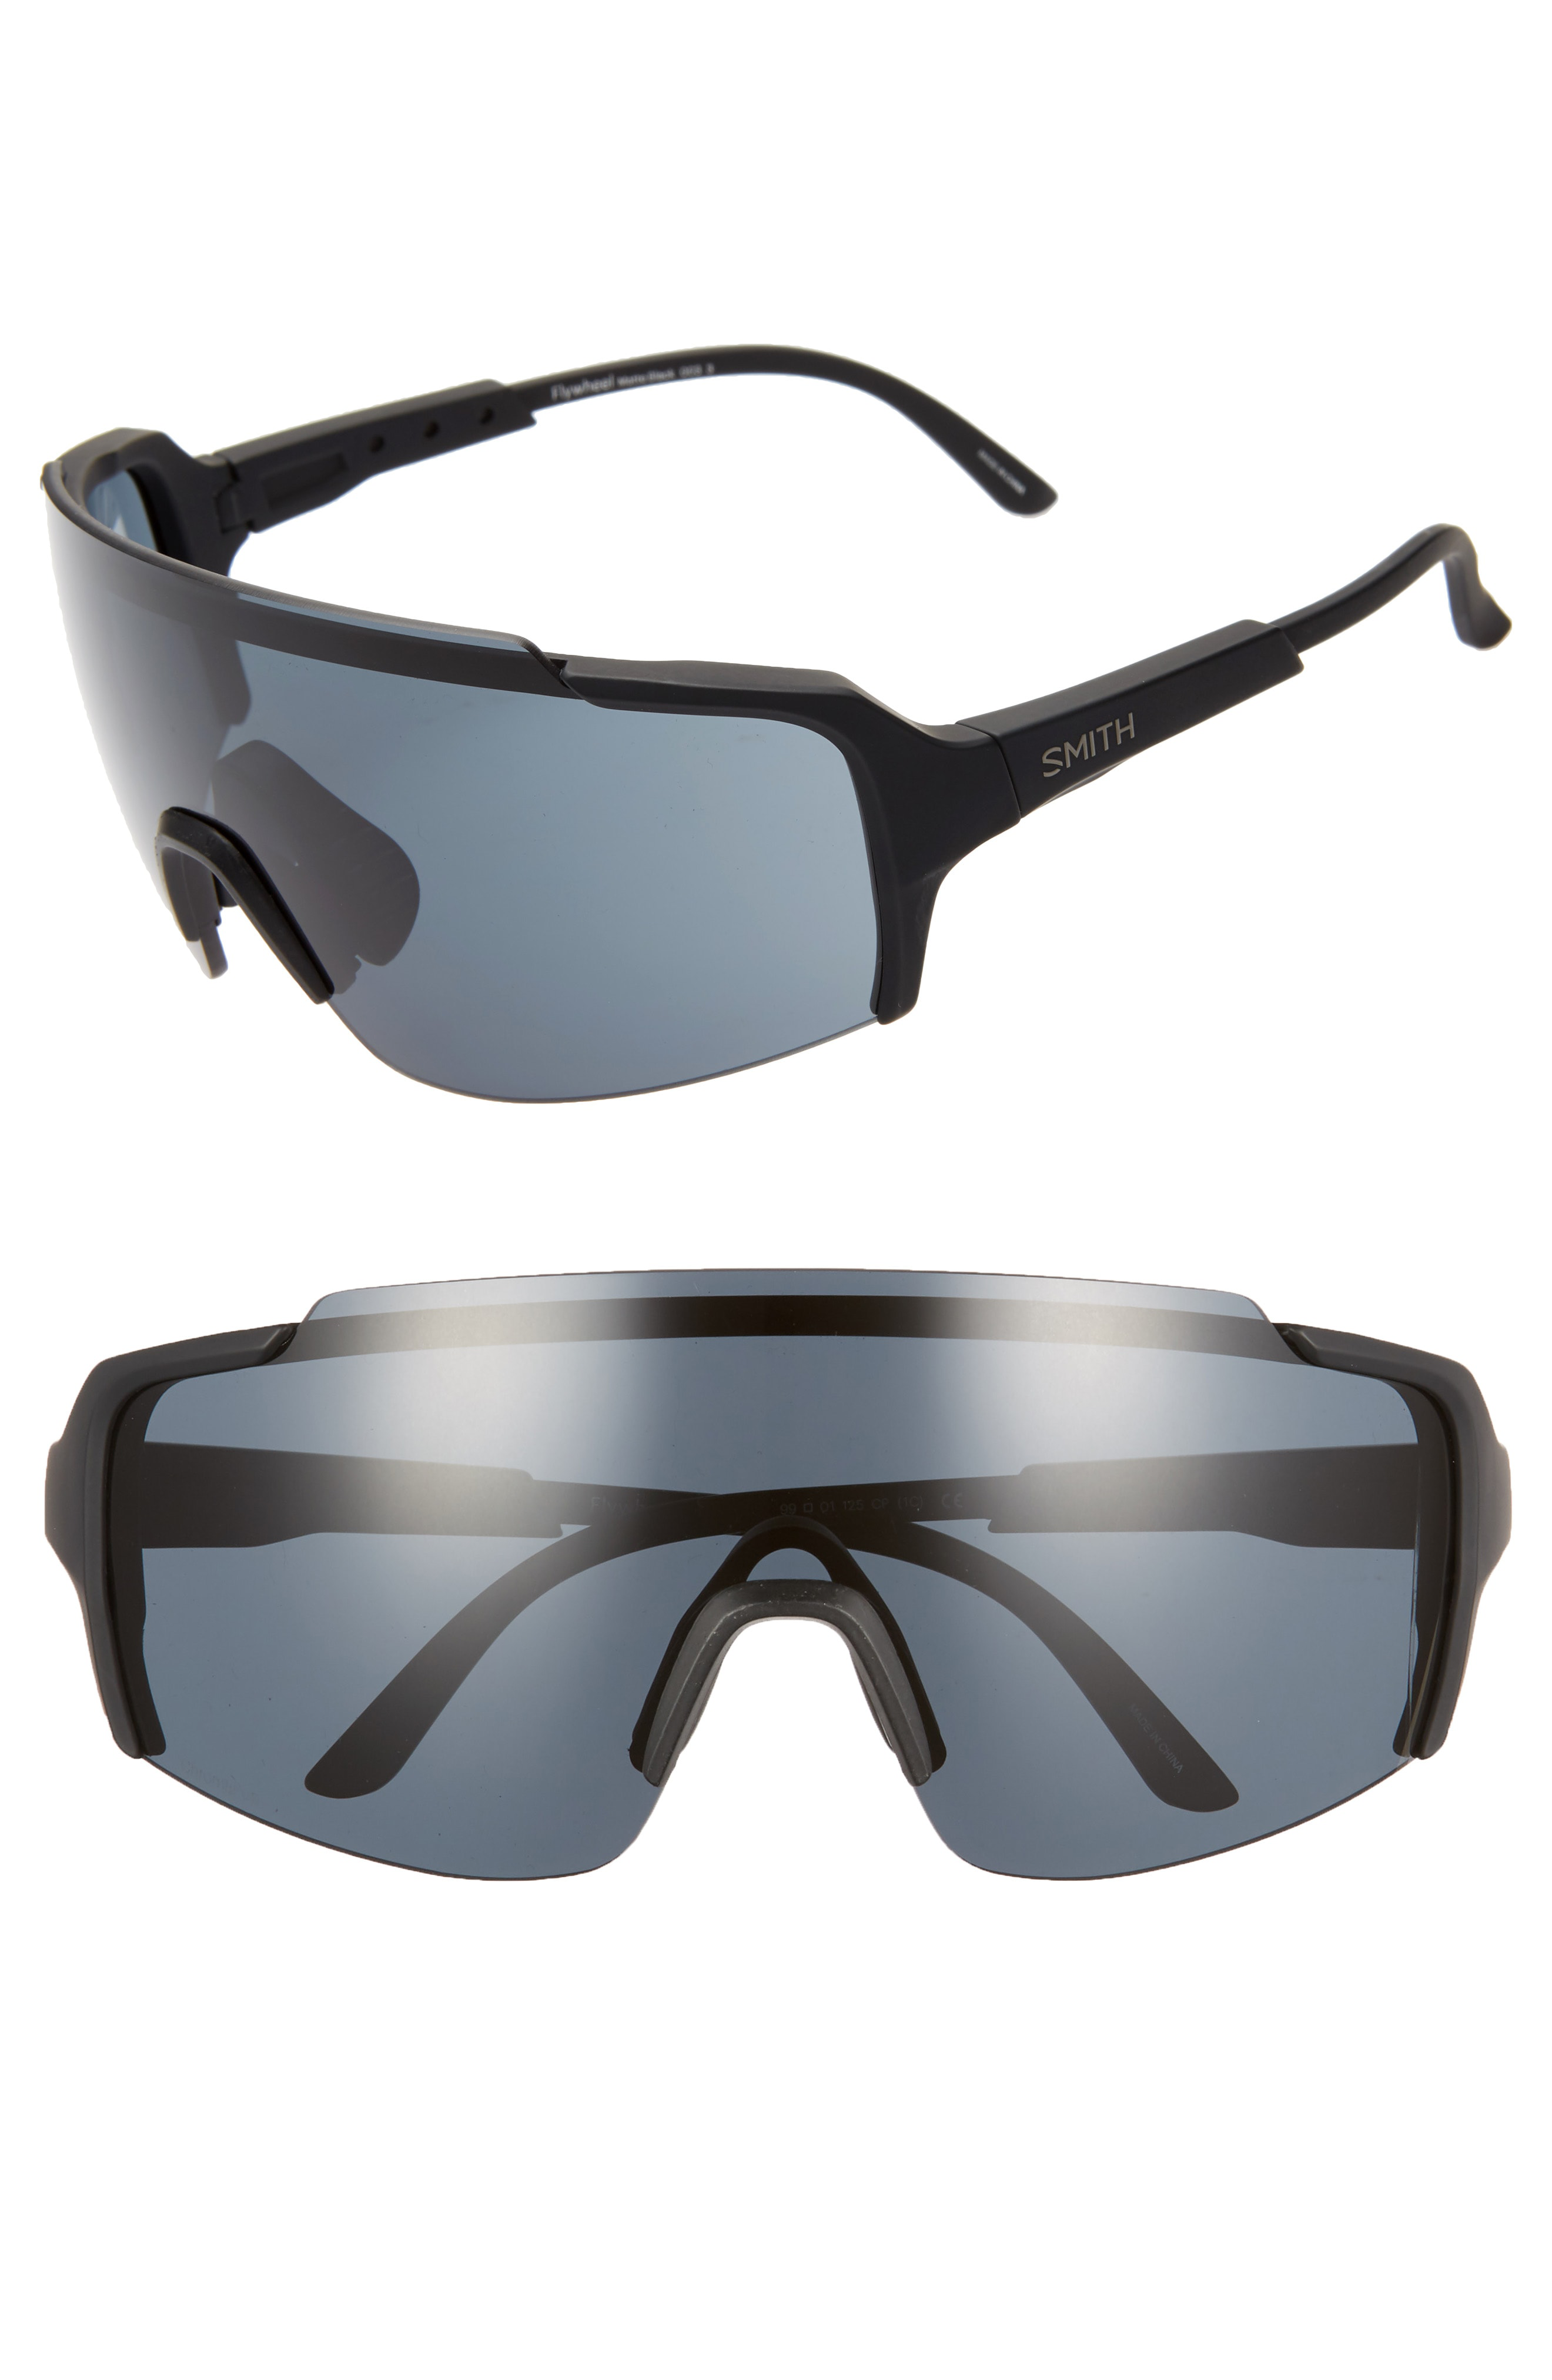 120aebb093db4 Smith Flywheel 160Mm Chromapop(Tm) Polarized Shield Sunglasses - Matte Black   Black